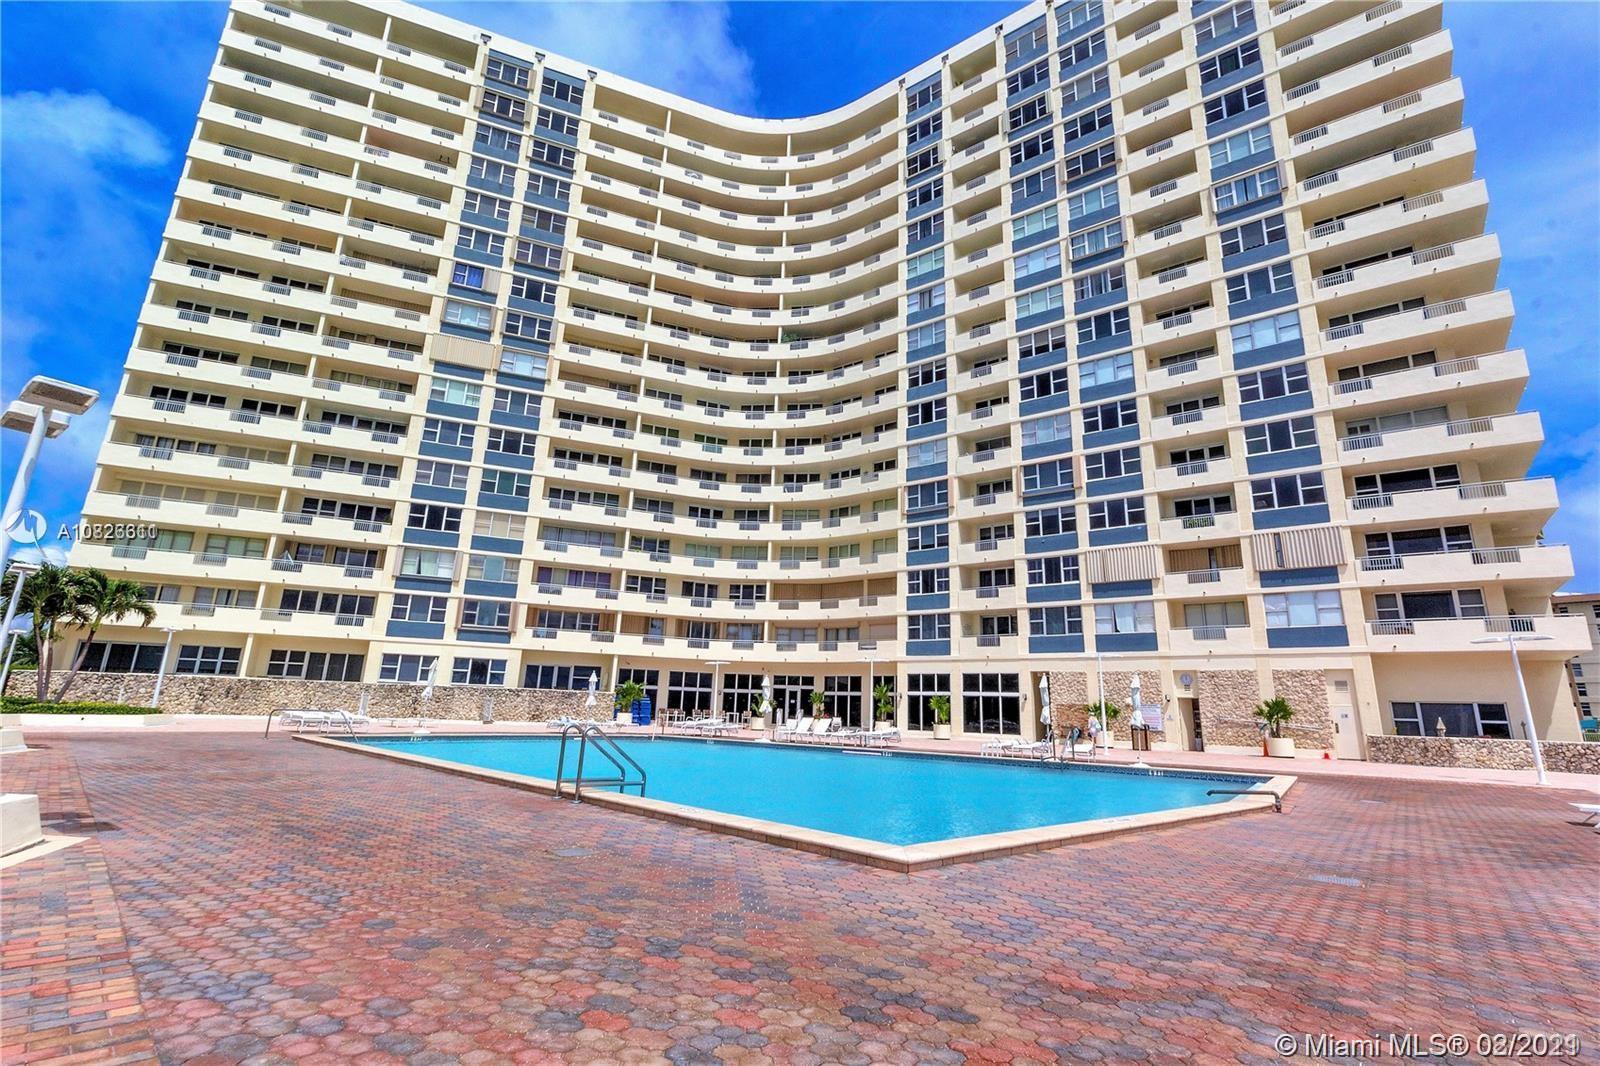 Parker Dorado #1408 - 3180 S Ocean Dr #1408, Hallandale Beach, FL 33009